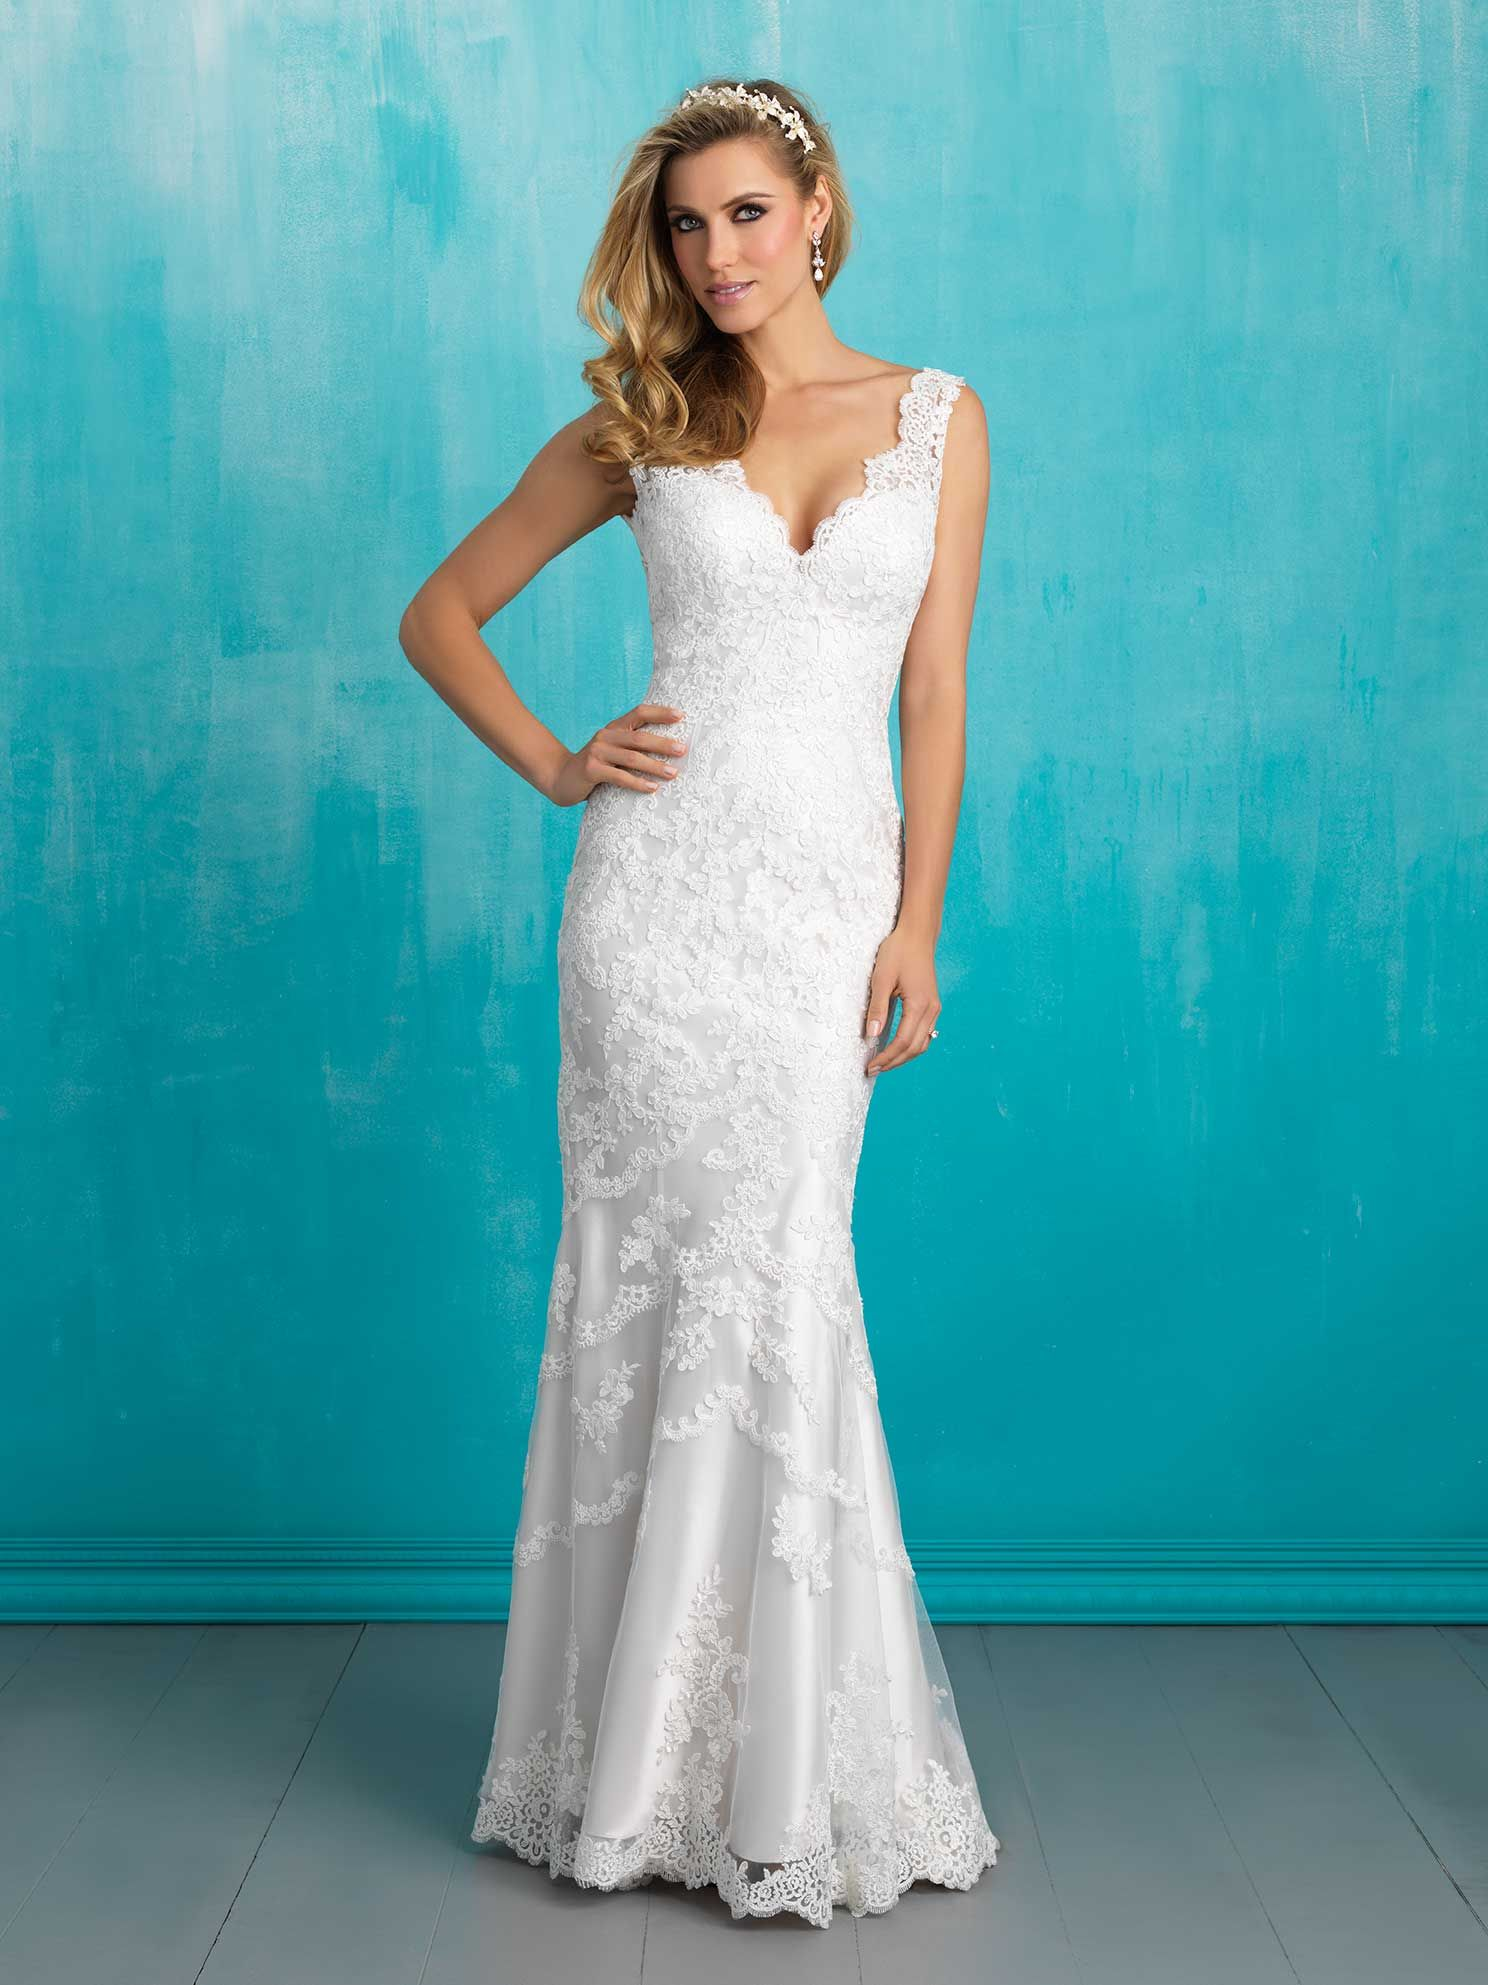 Vestido de Novia Allure S9304 - Maribel Arango Novias | wedding ...